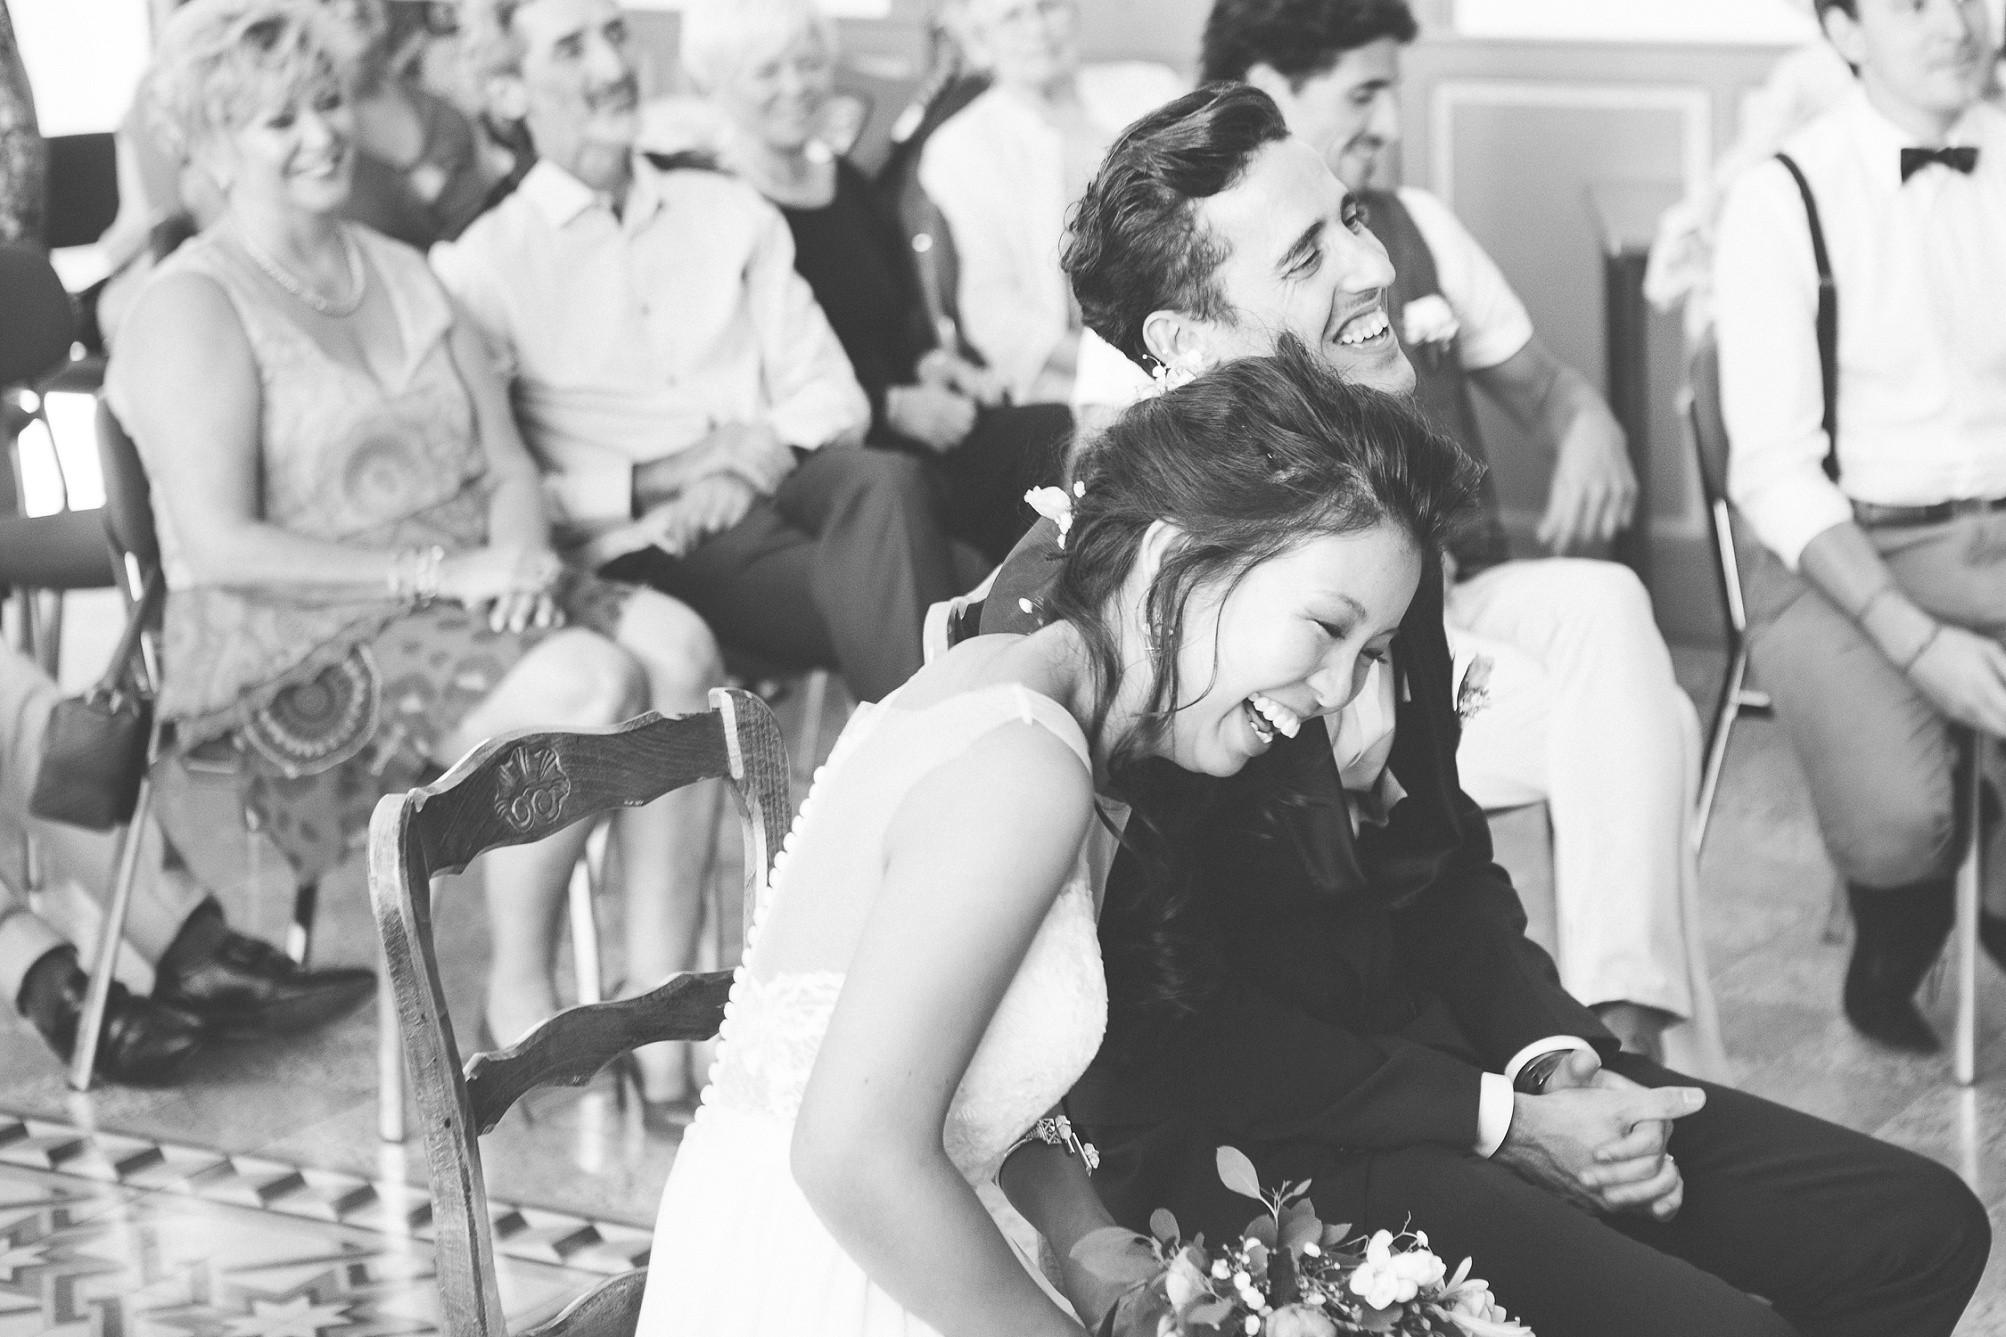 katerynaphotos-mariage-photographe-puyloubier-provence-aix-en-provence-sud-de-la-france_0365.jpg